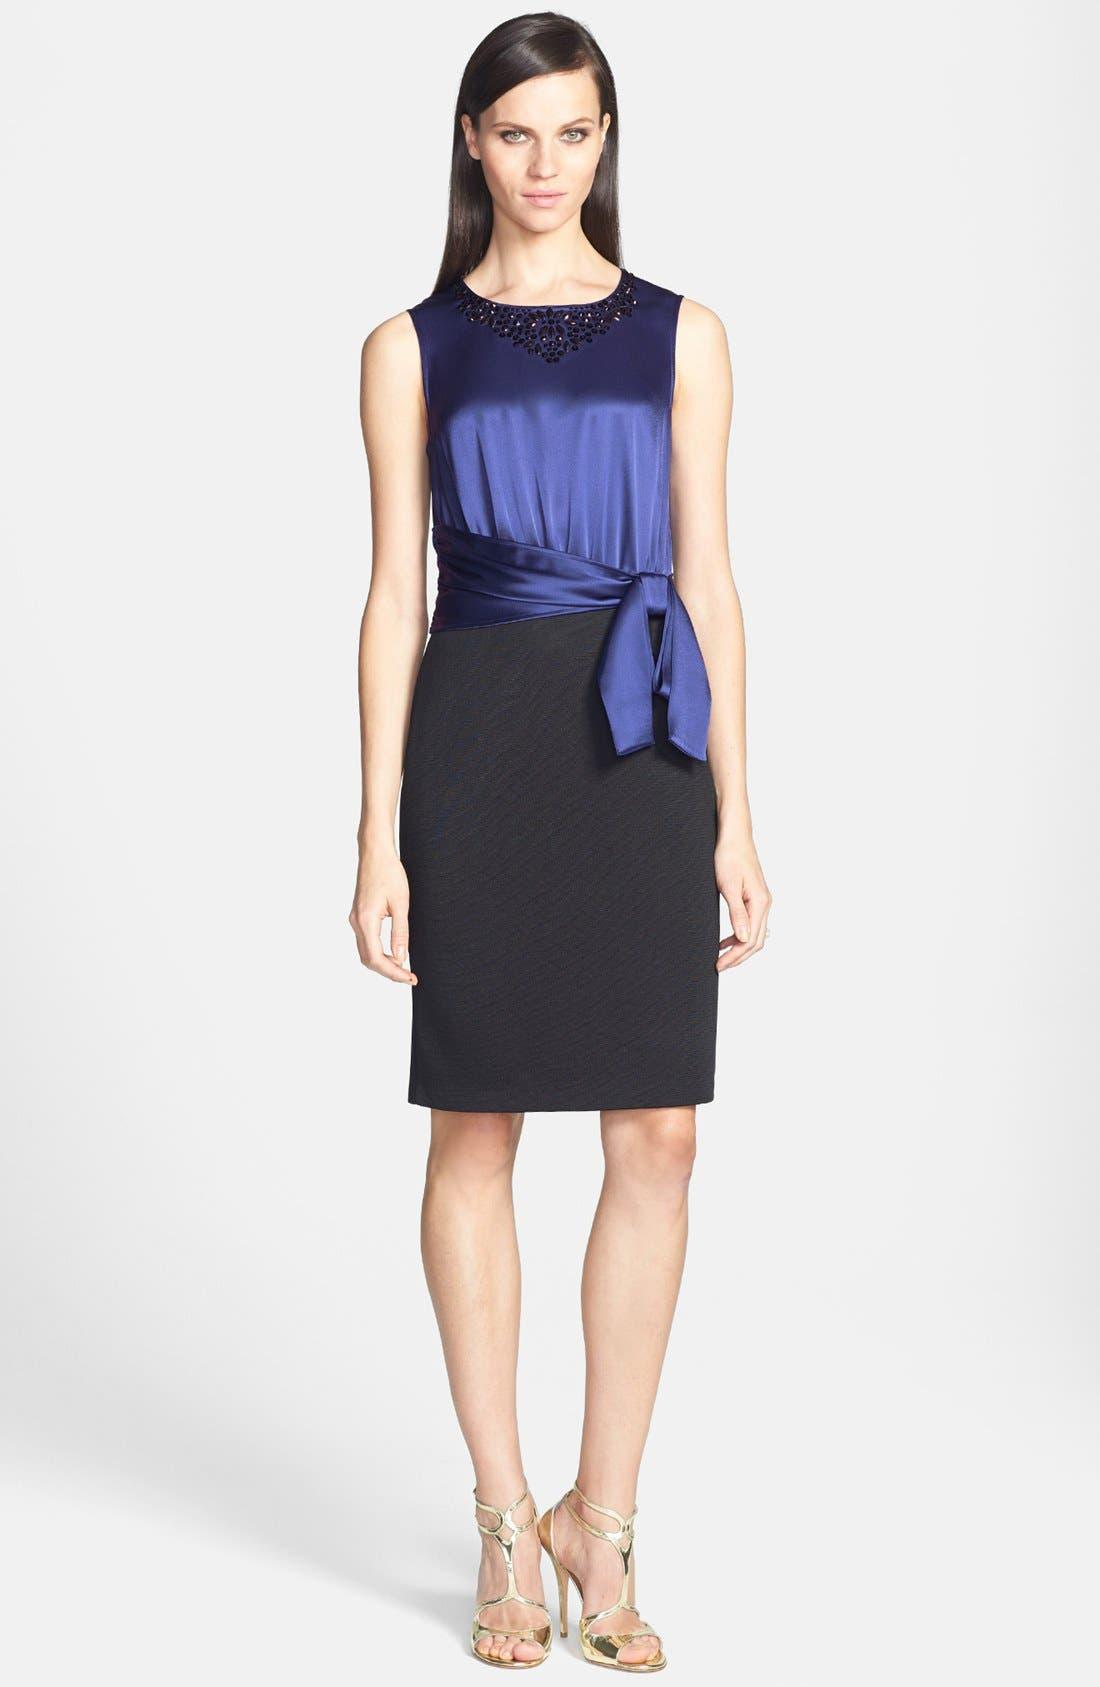 Main Image - St. John Collection Embellished Liquid Satin & Milano Knit Dress